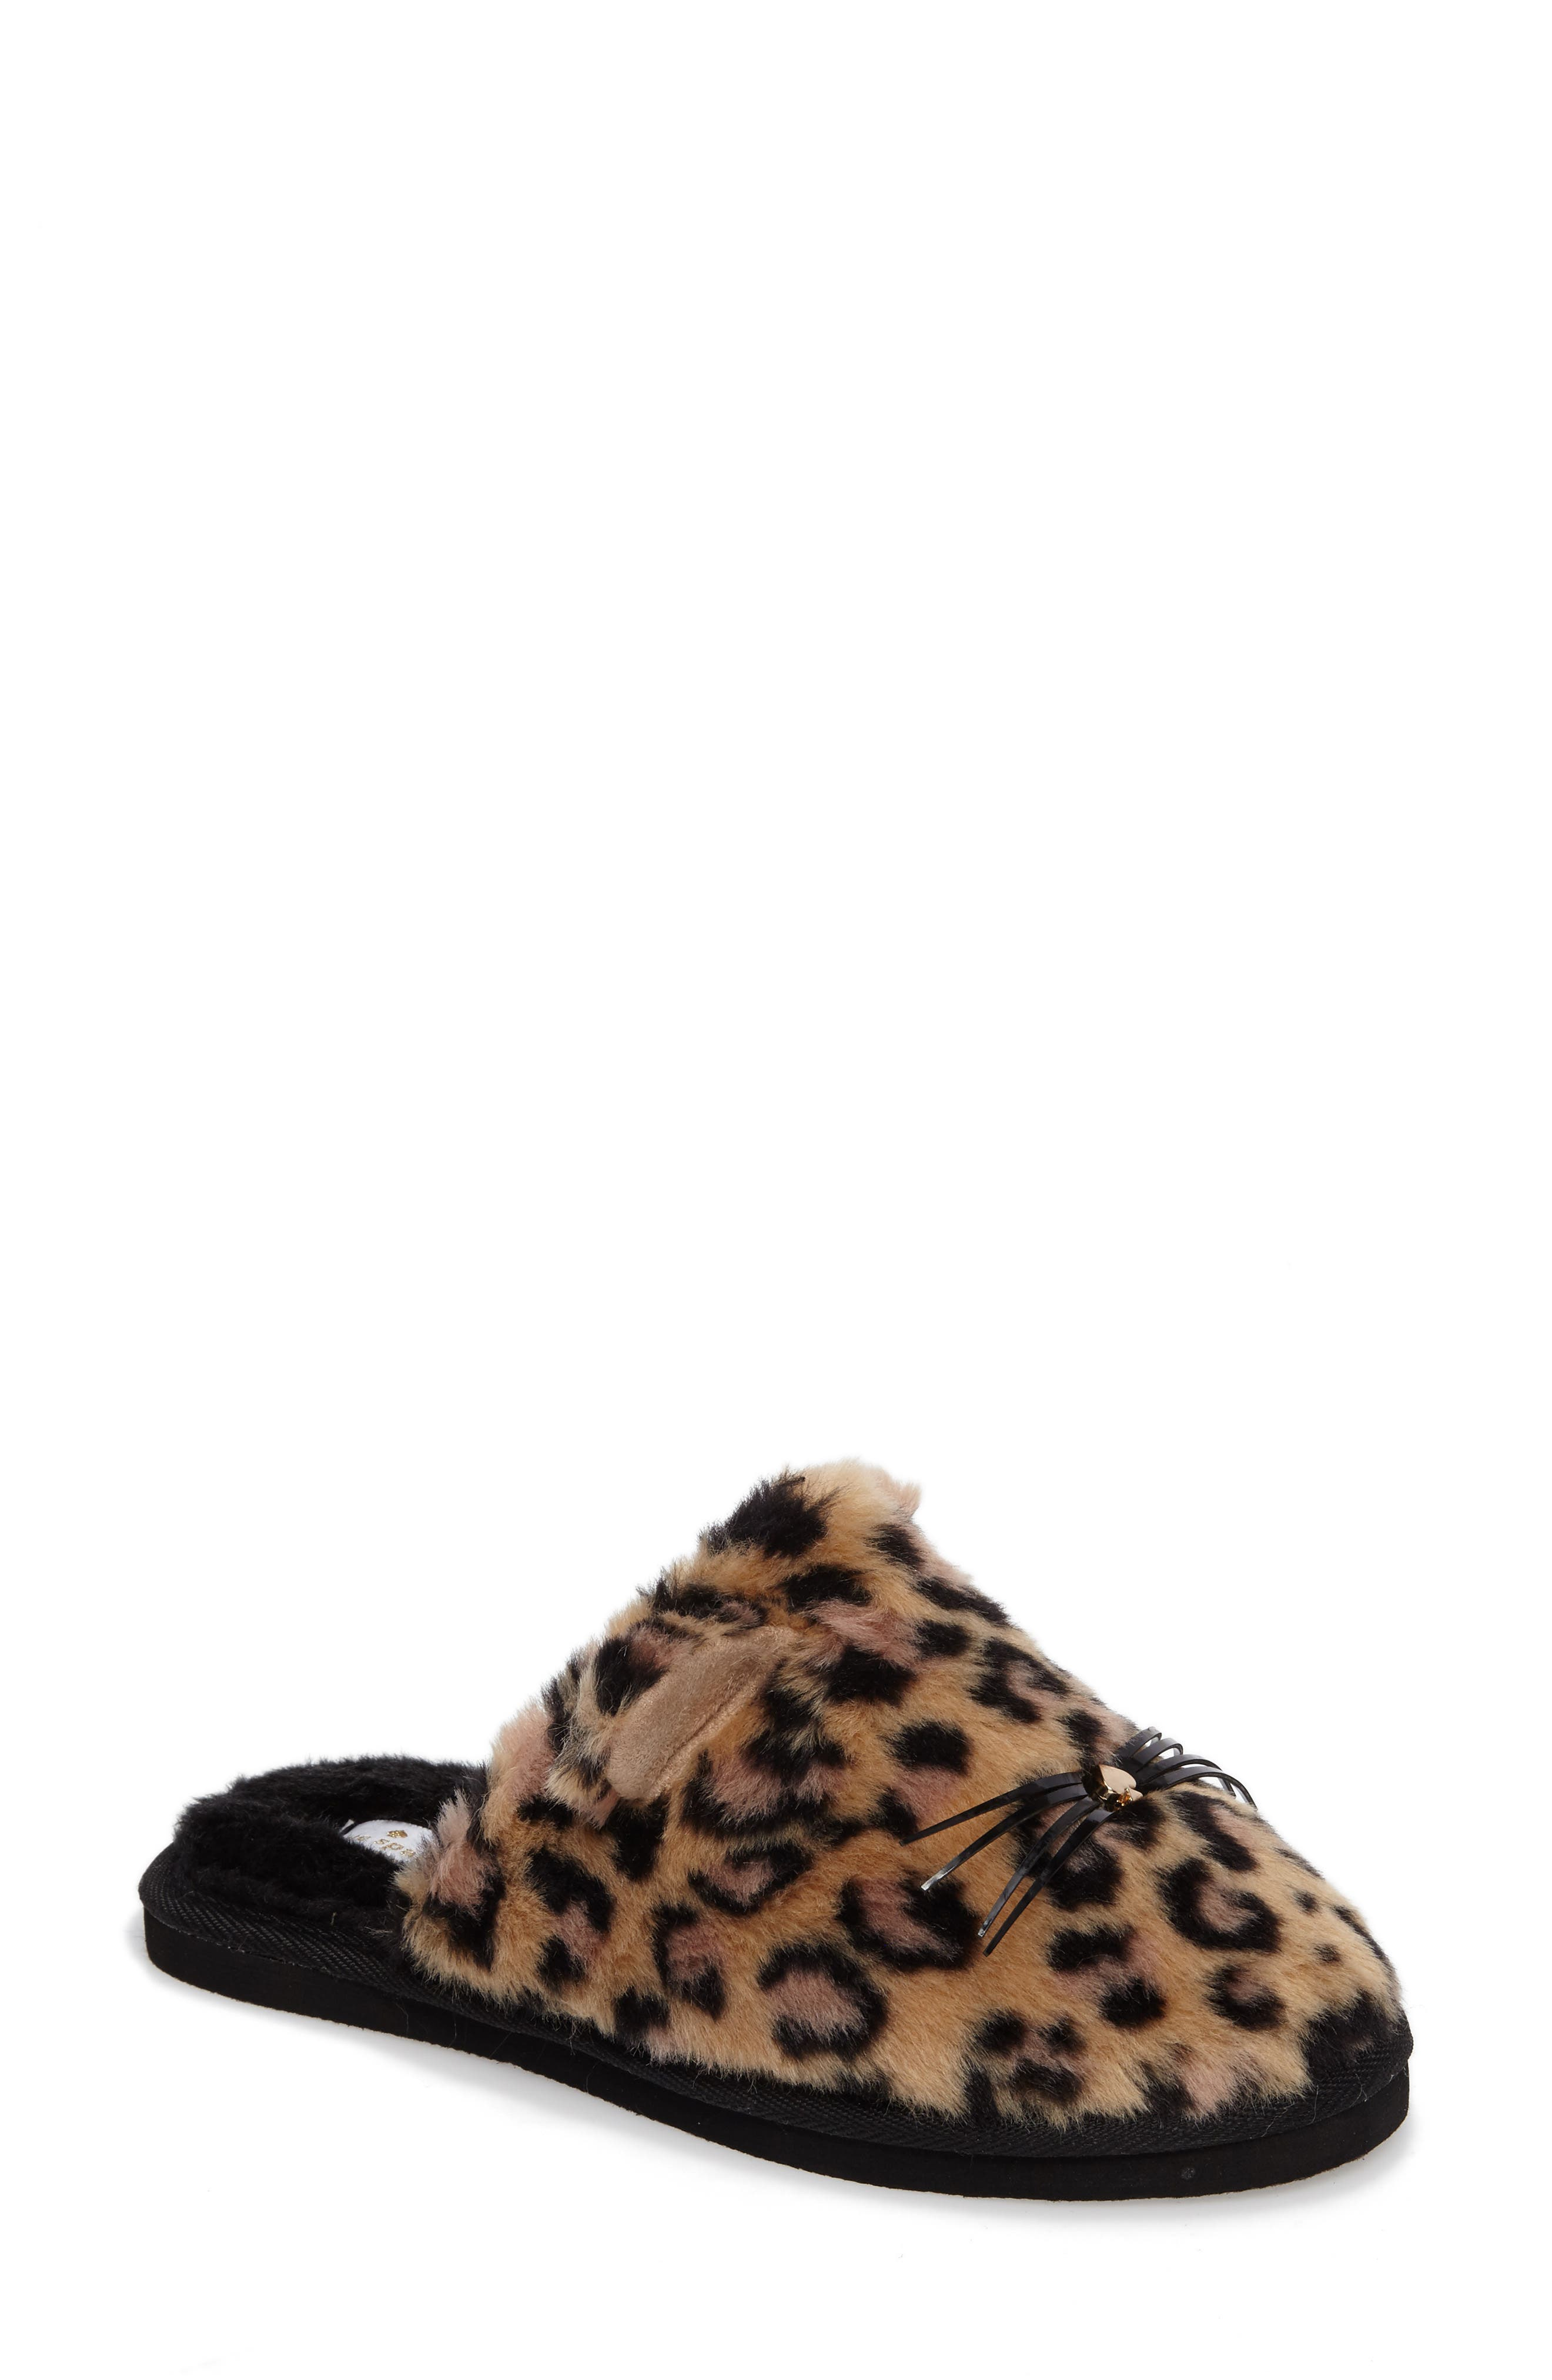 kate spade new york belindy scuff slipper (Women)